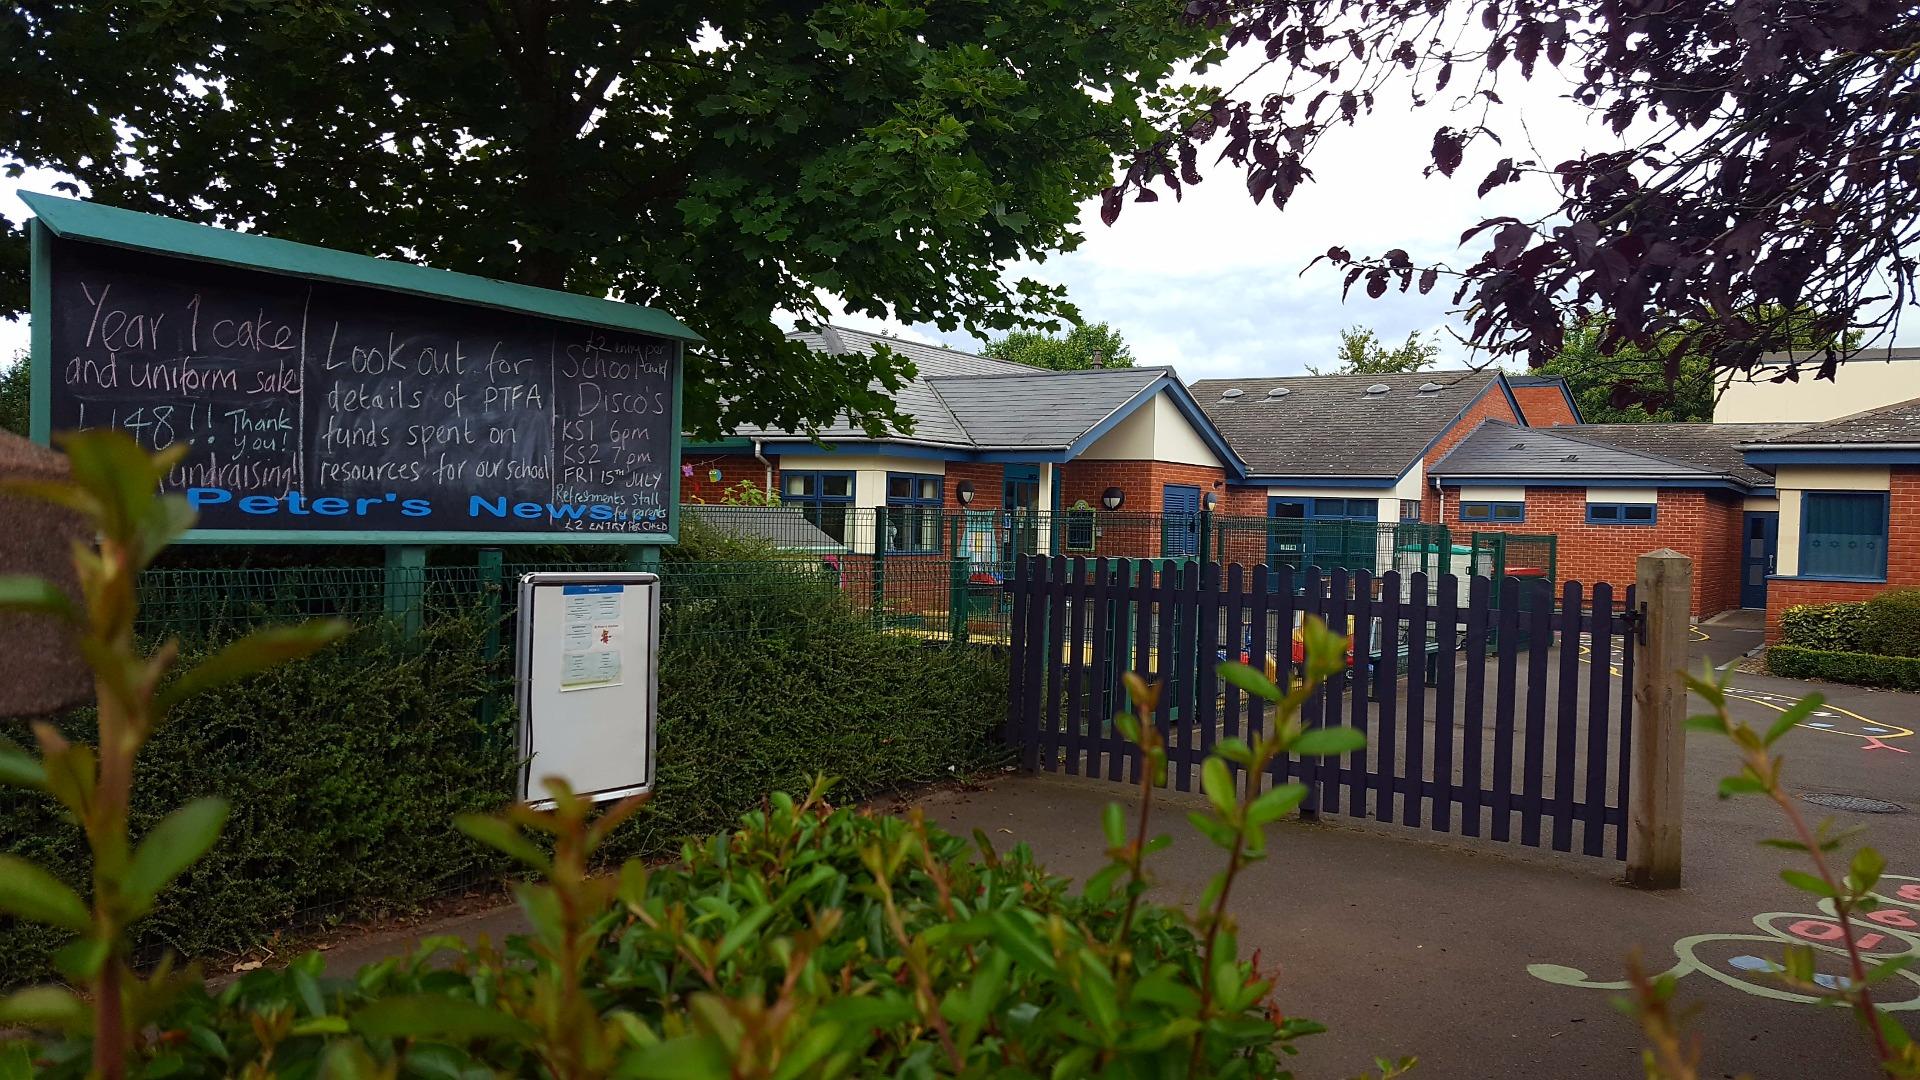 Edgmond Parish Council Working With The Community